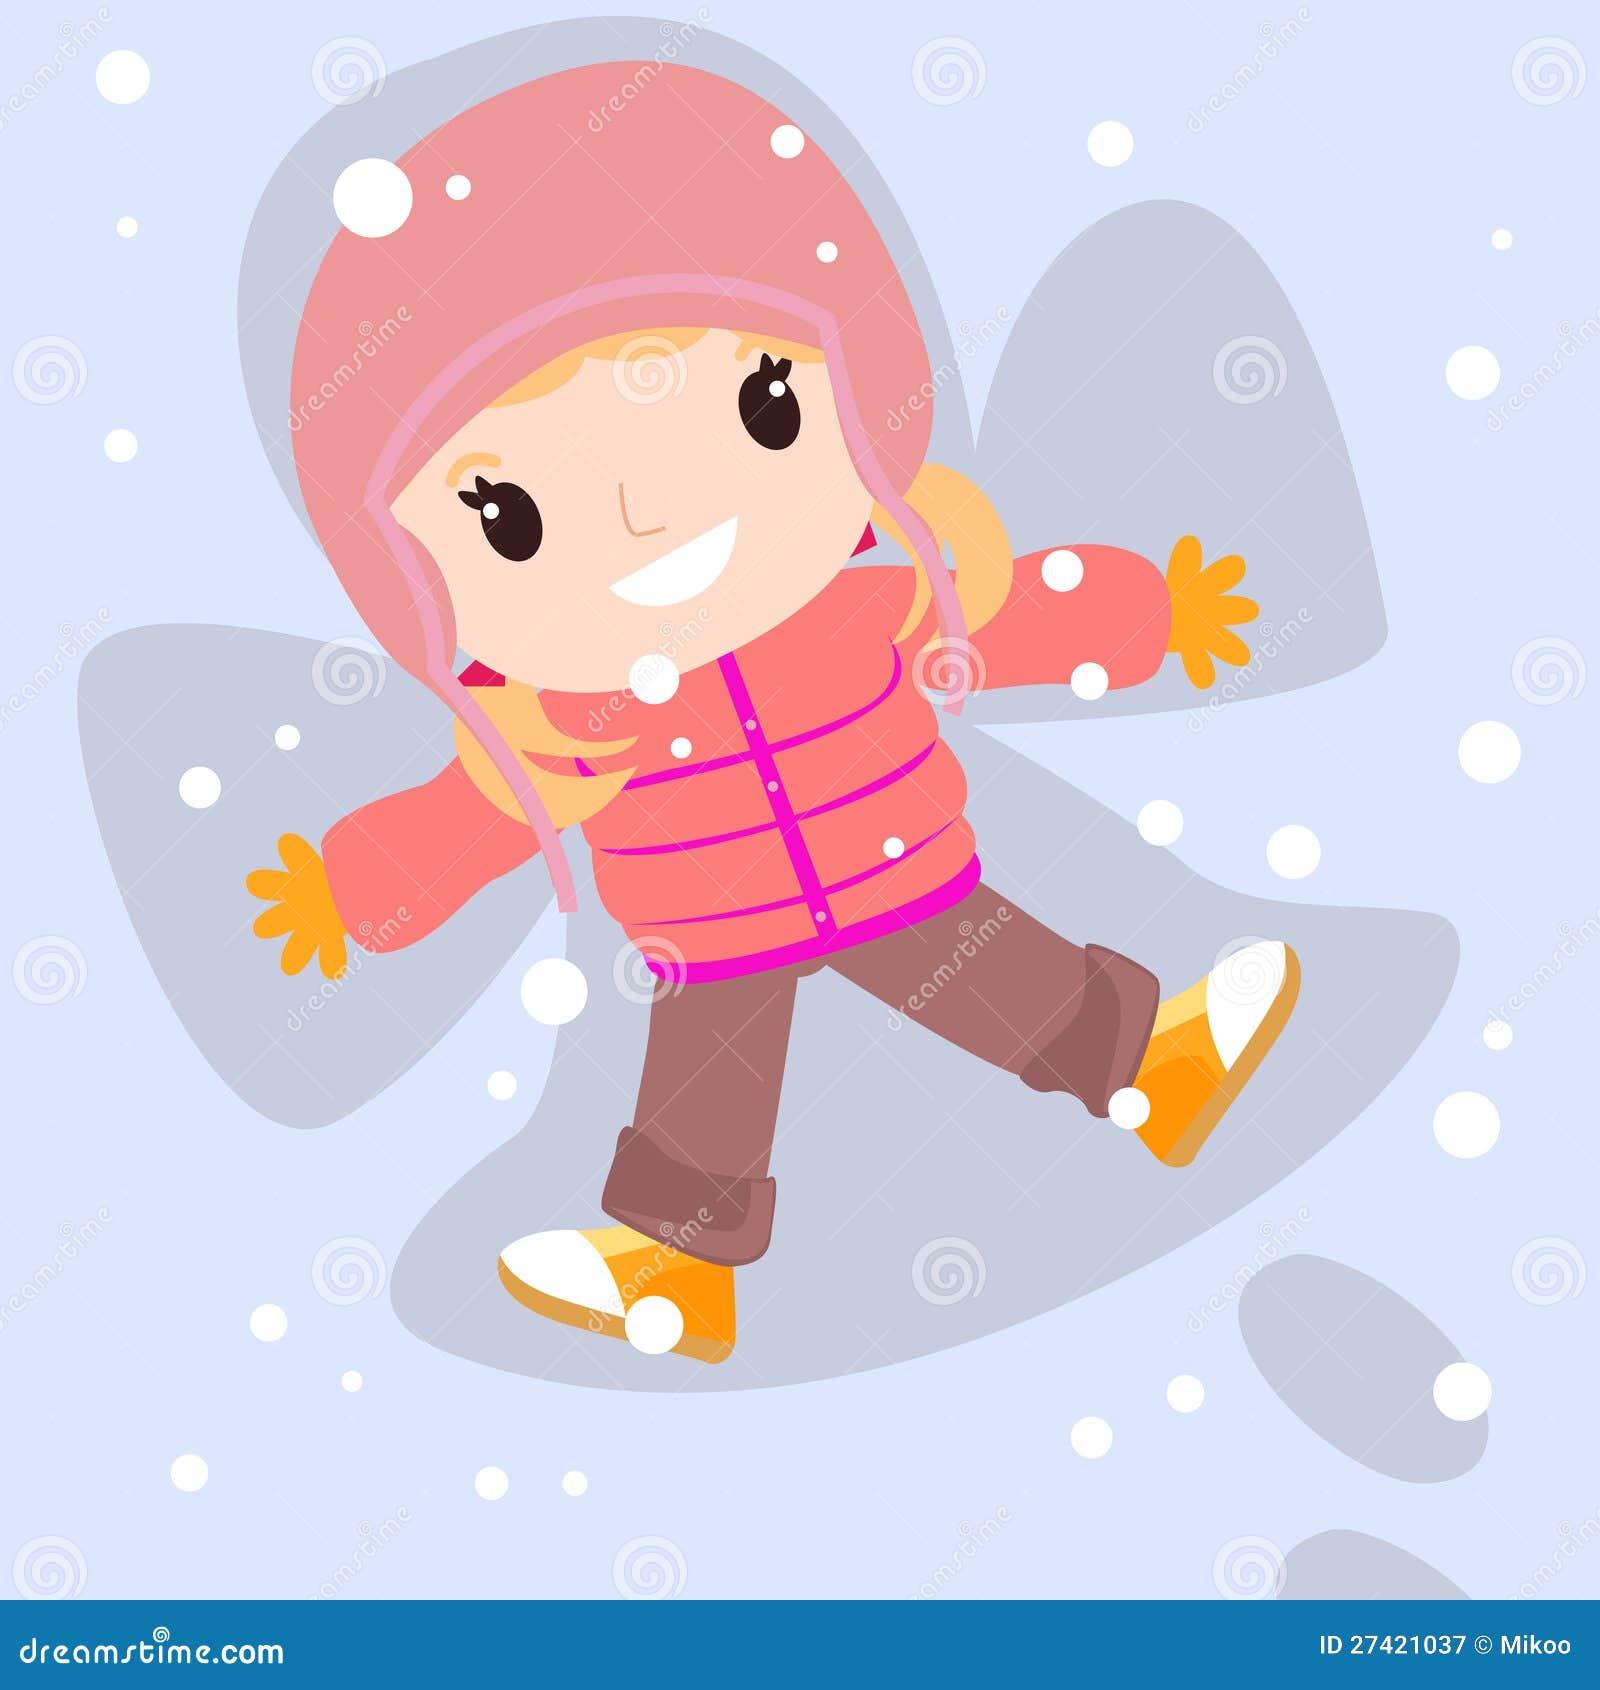 snow angel wallpaper cartoon - photo #14